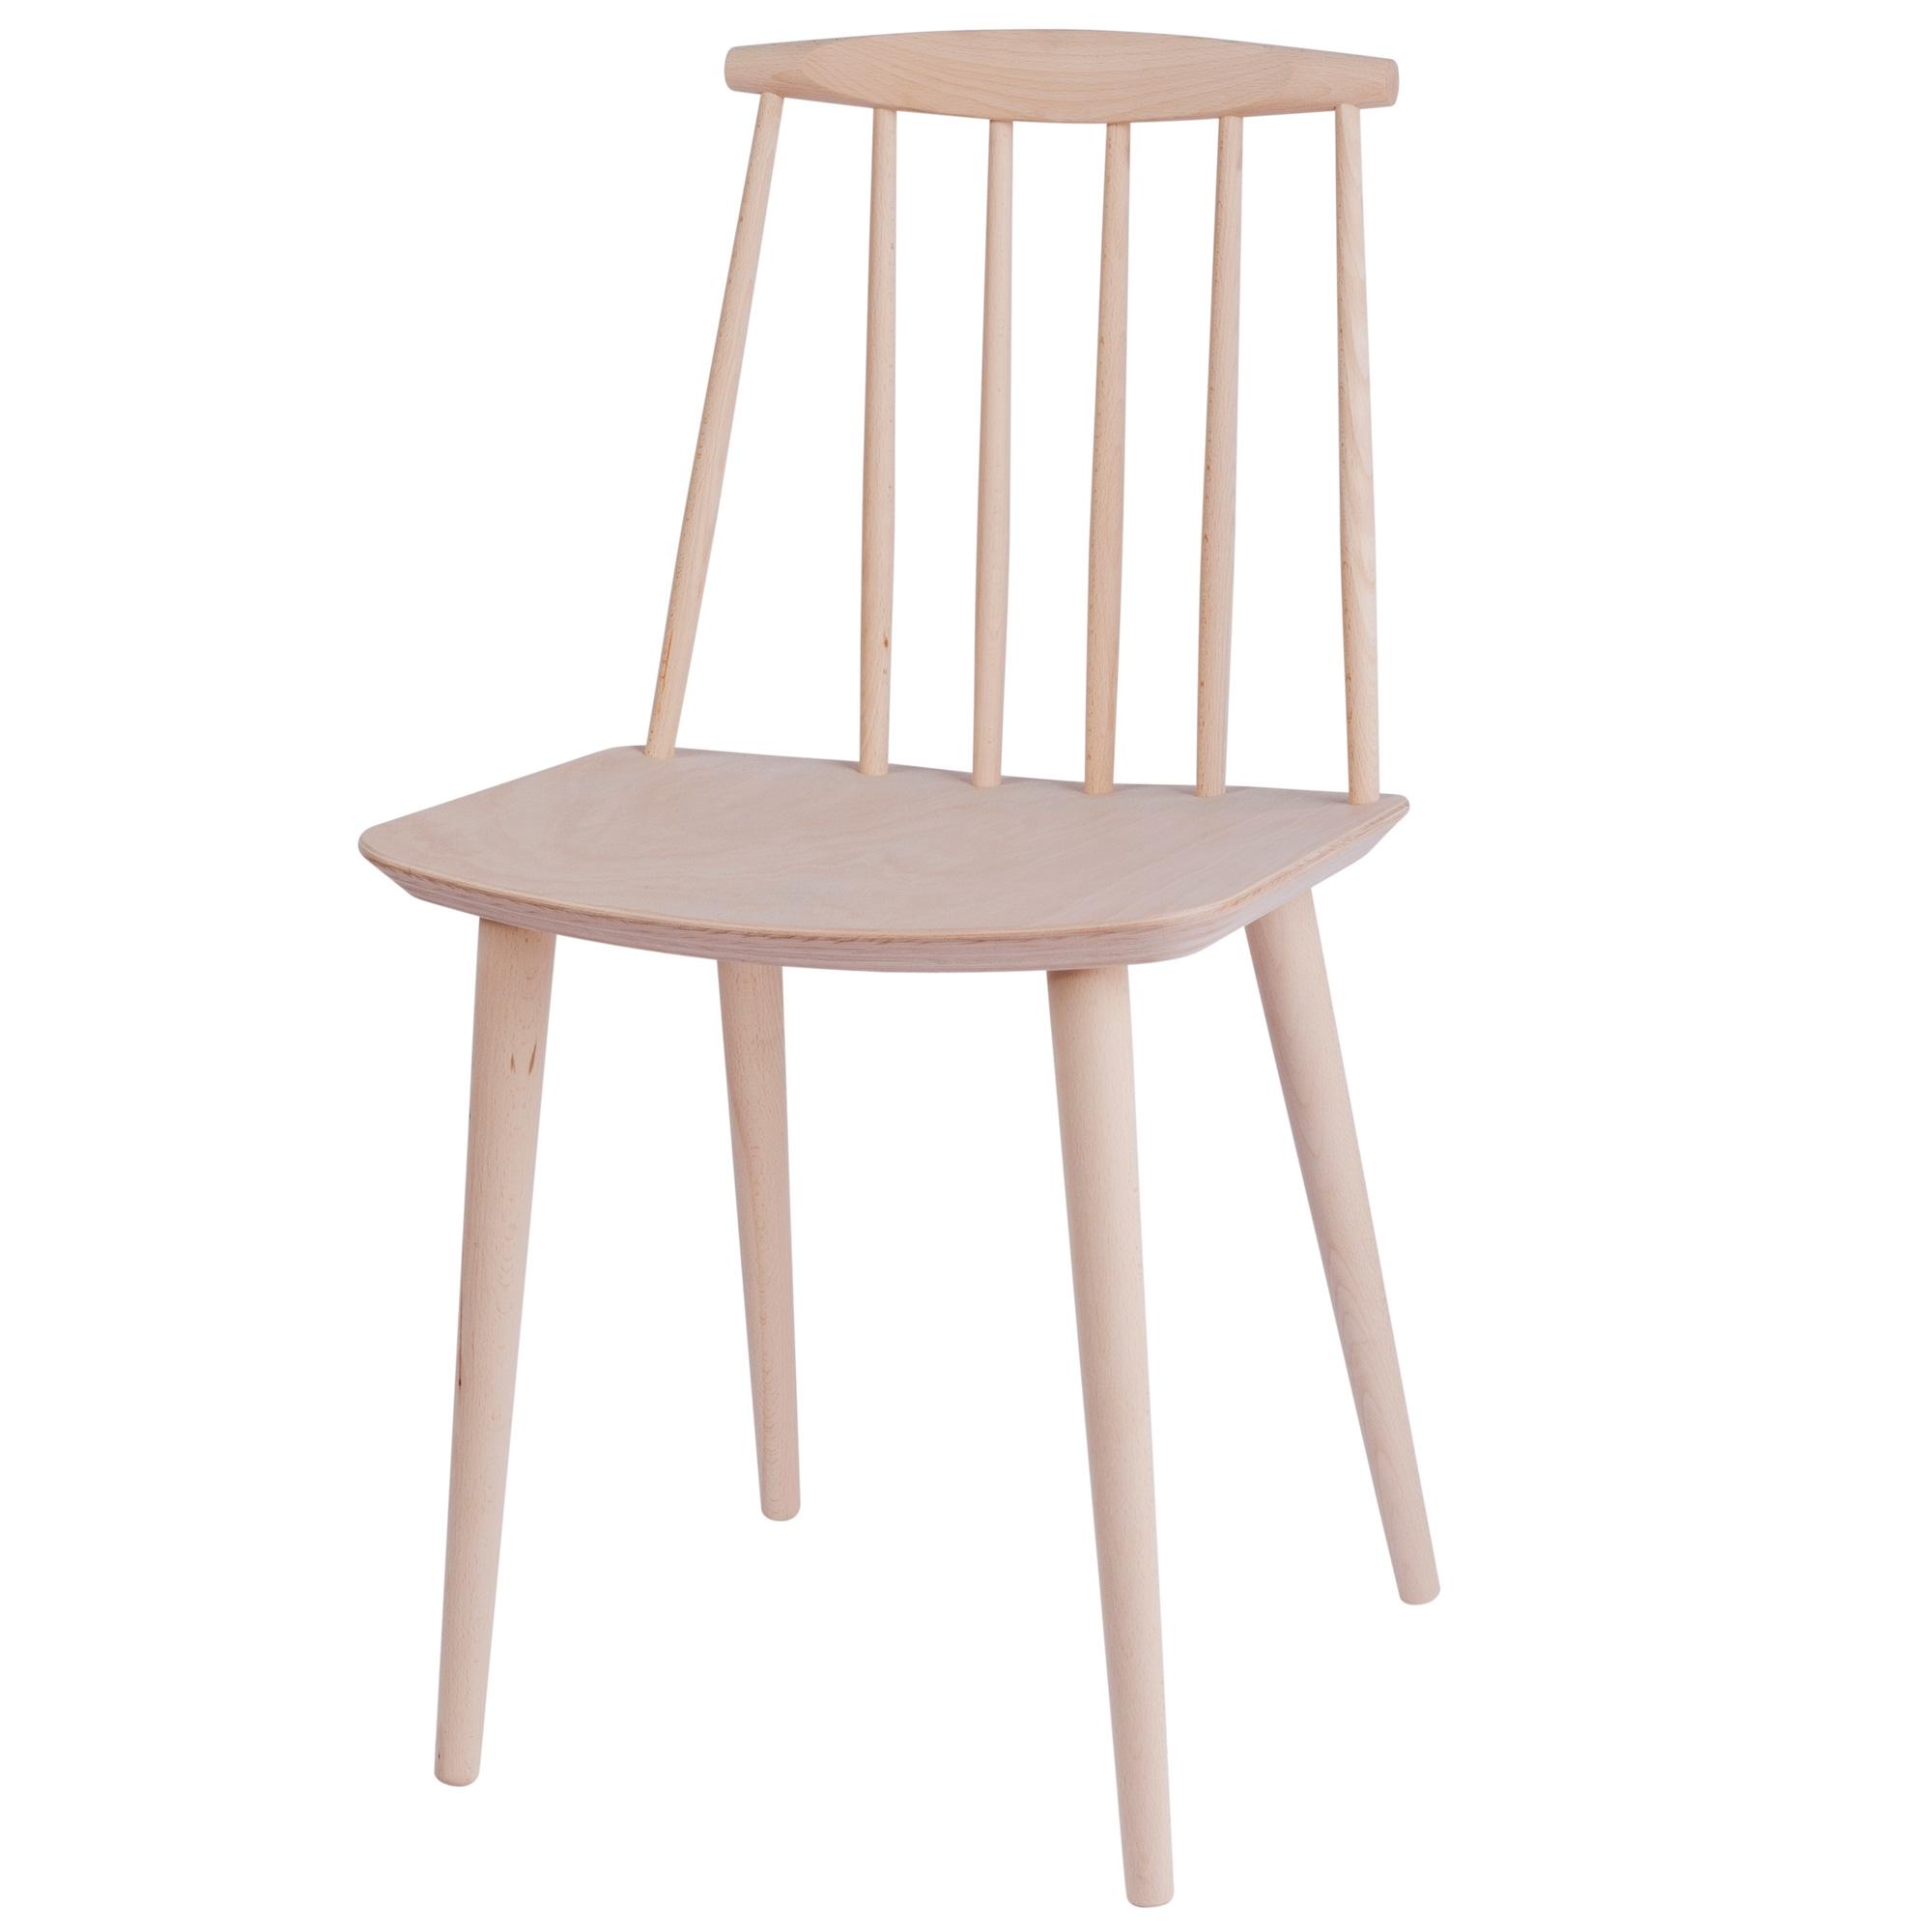 selinesteba.com - hay-j77-stoel.jpg